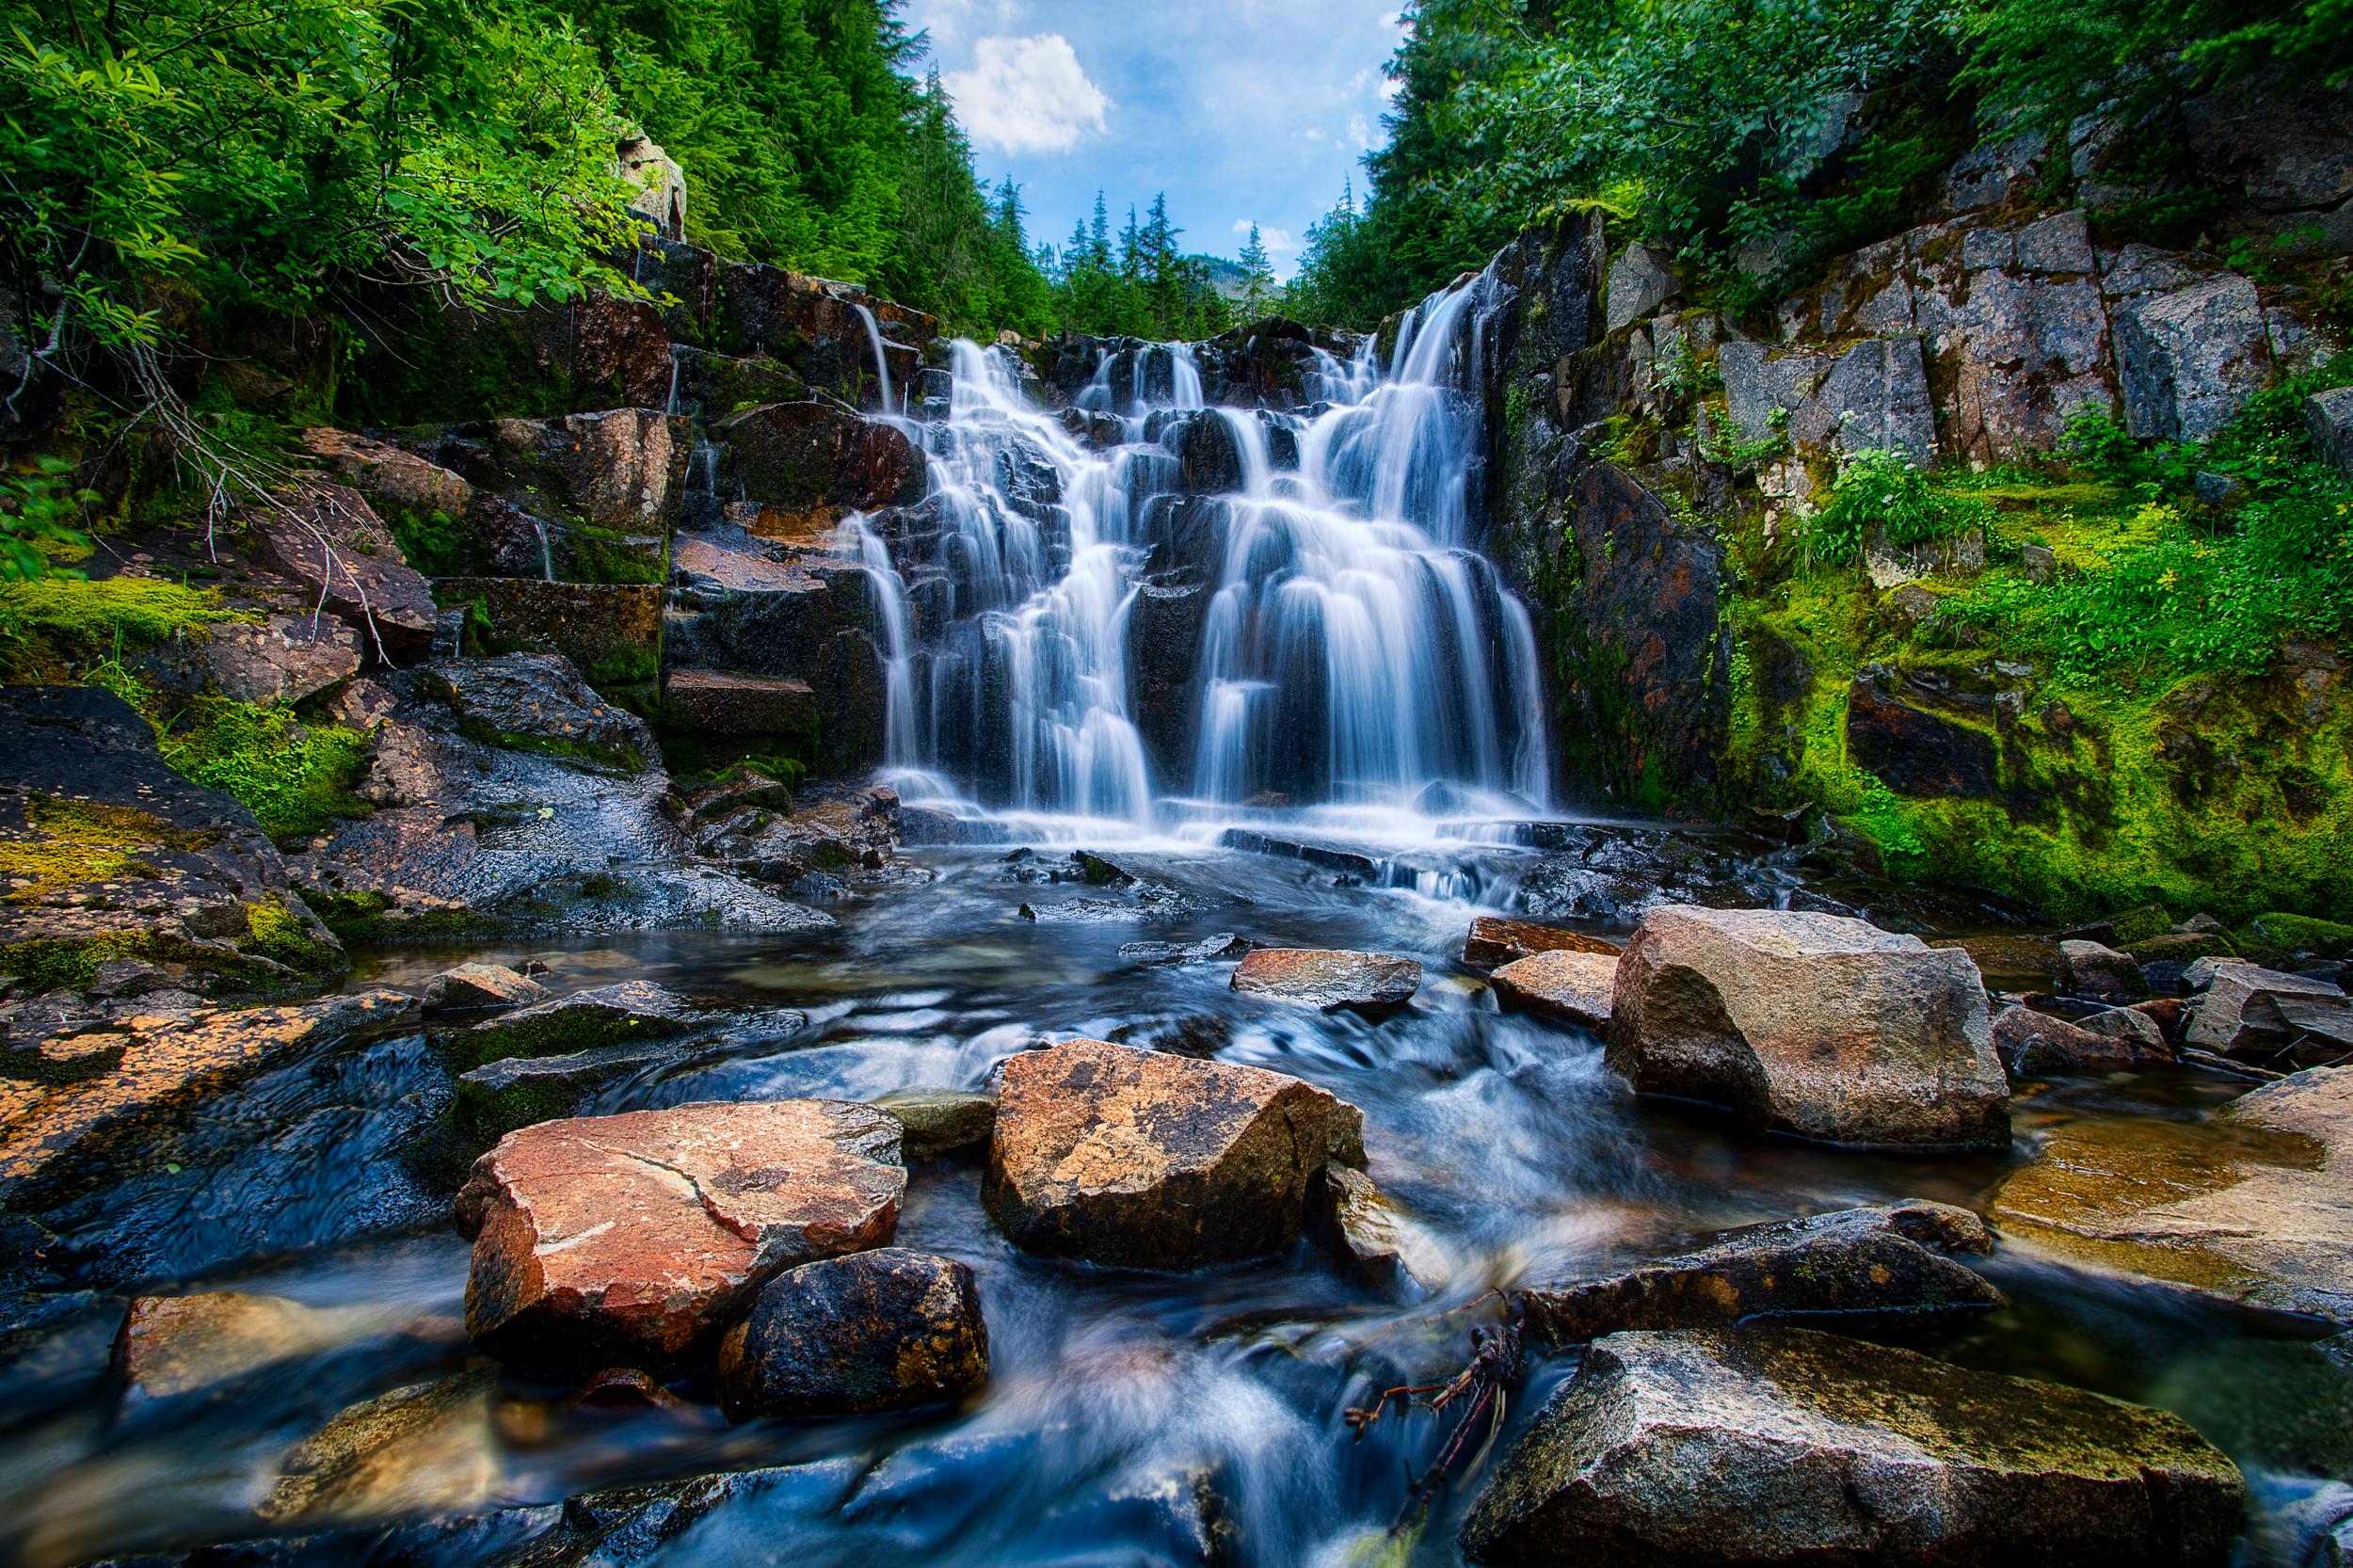 Waterfall-in-Mount-Rainier-National-Park-by-Michael-Matti